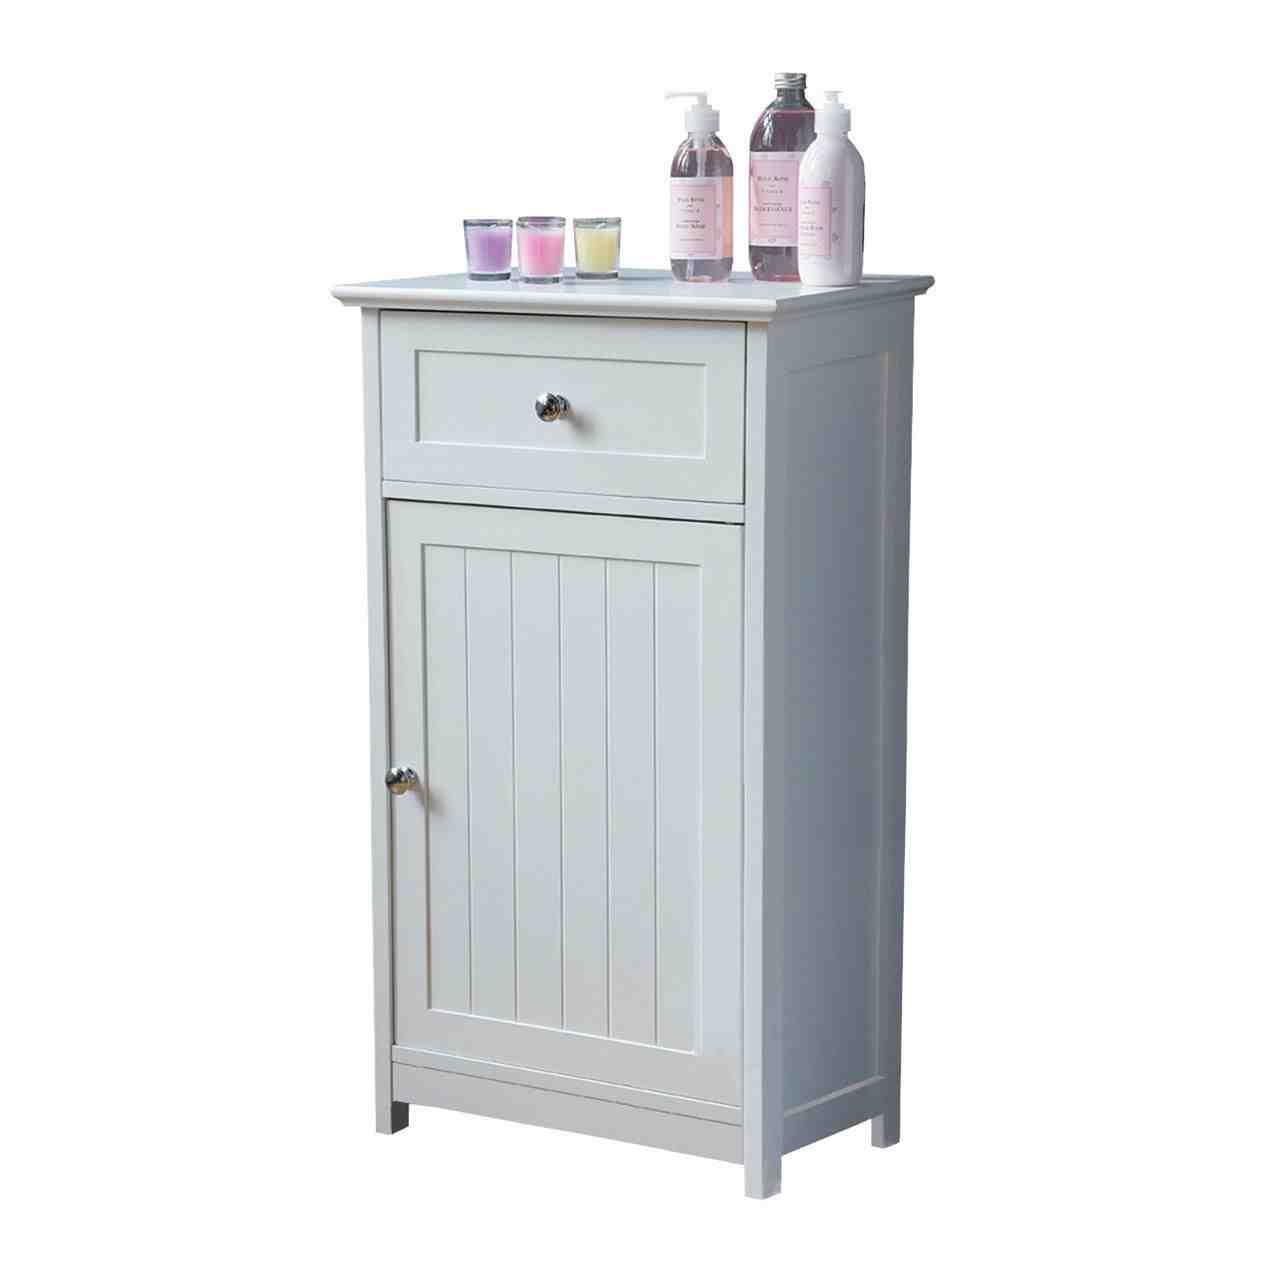 White Storage Cabinet for Bathroom | Better white bathroom cabinet ...